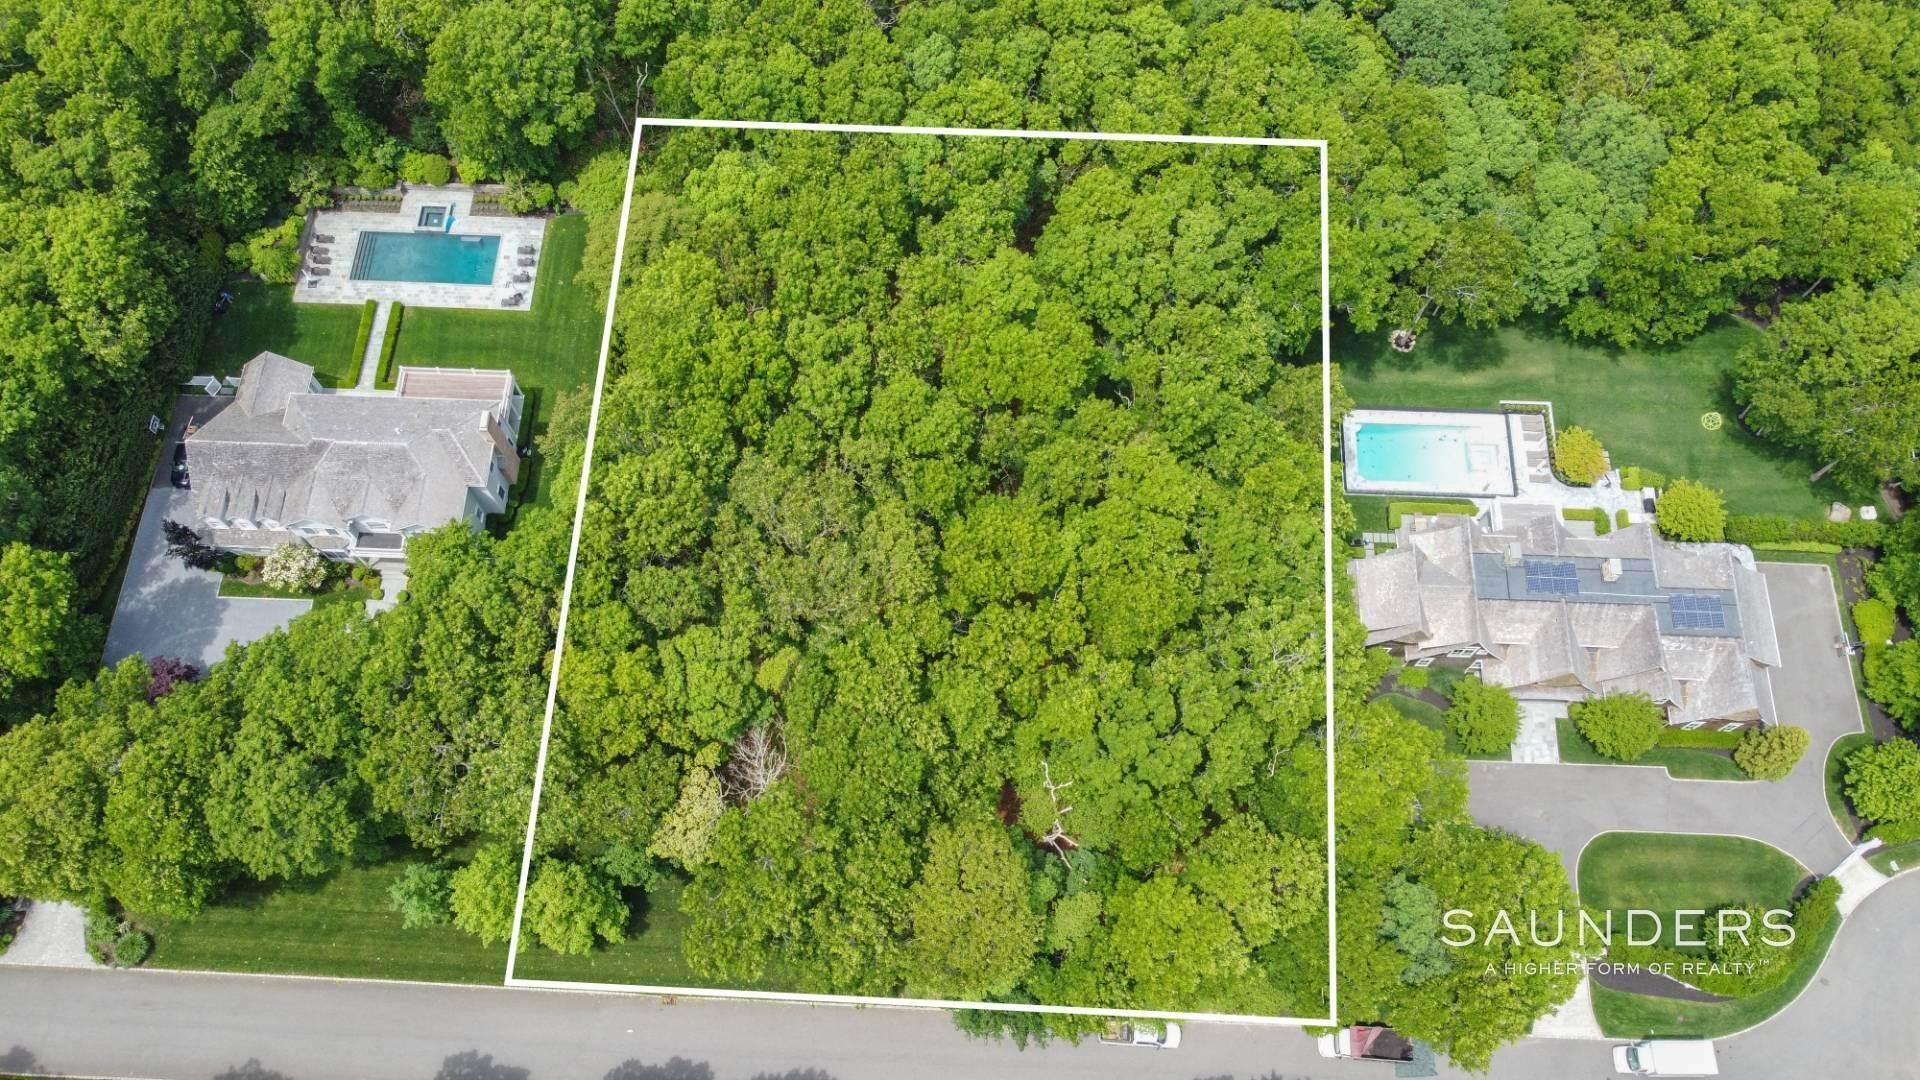 3. Land for Sale at Rare Prime Building Lot In Bridgehampton Bordering Reserve 30 Fair Hills Lane, Bridgehampton, Southampton Town, NY 11932